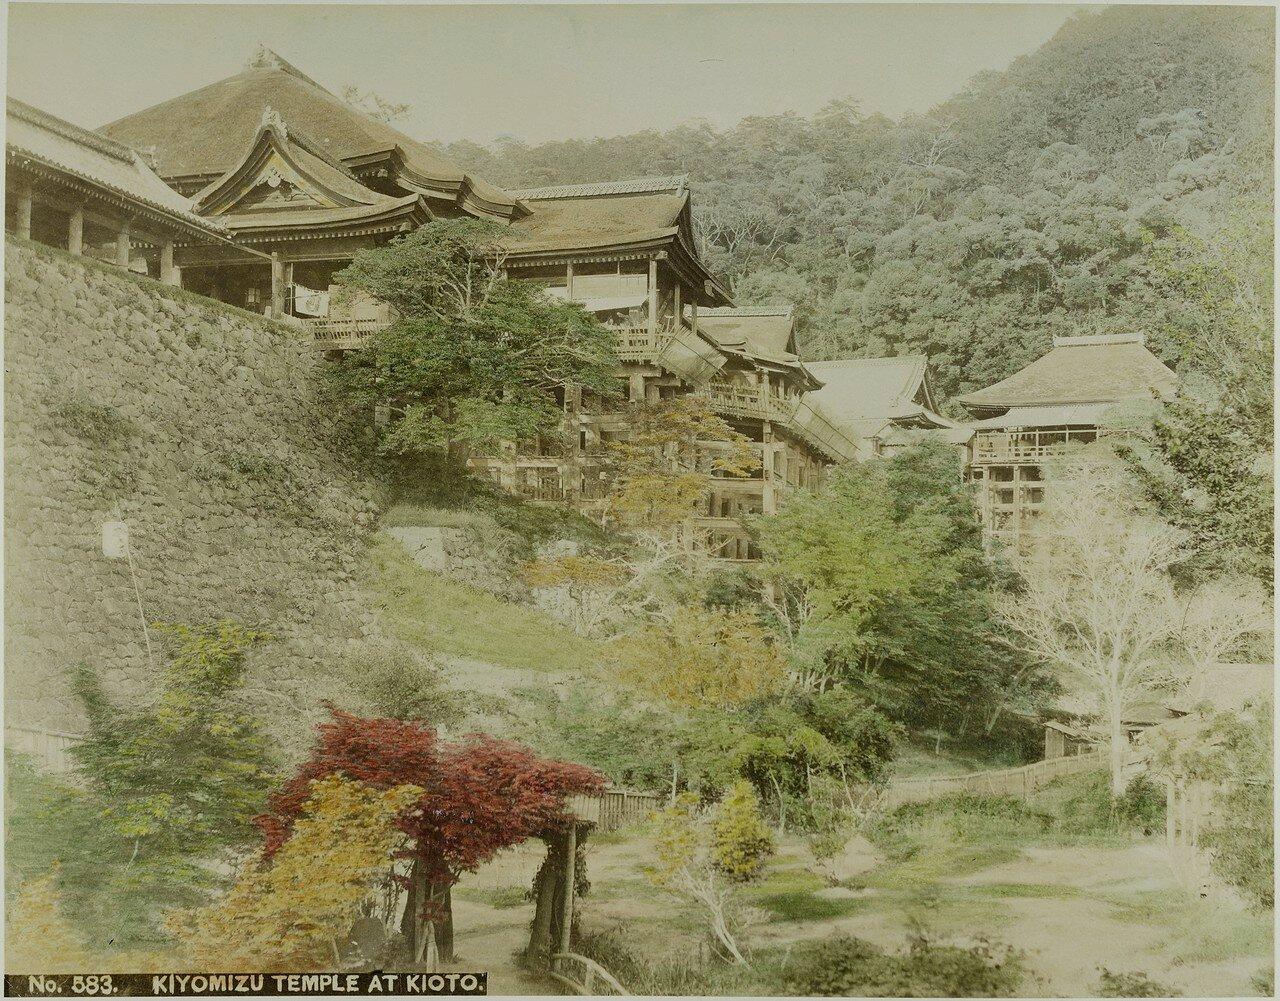 Киото. Киёмидзу-дэра